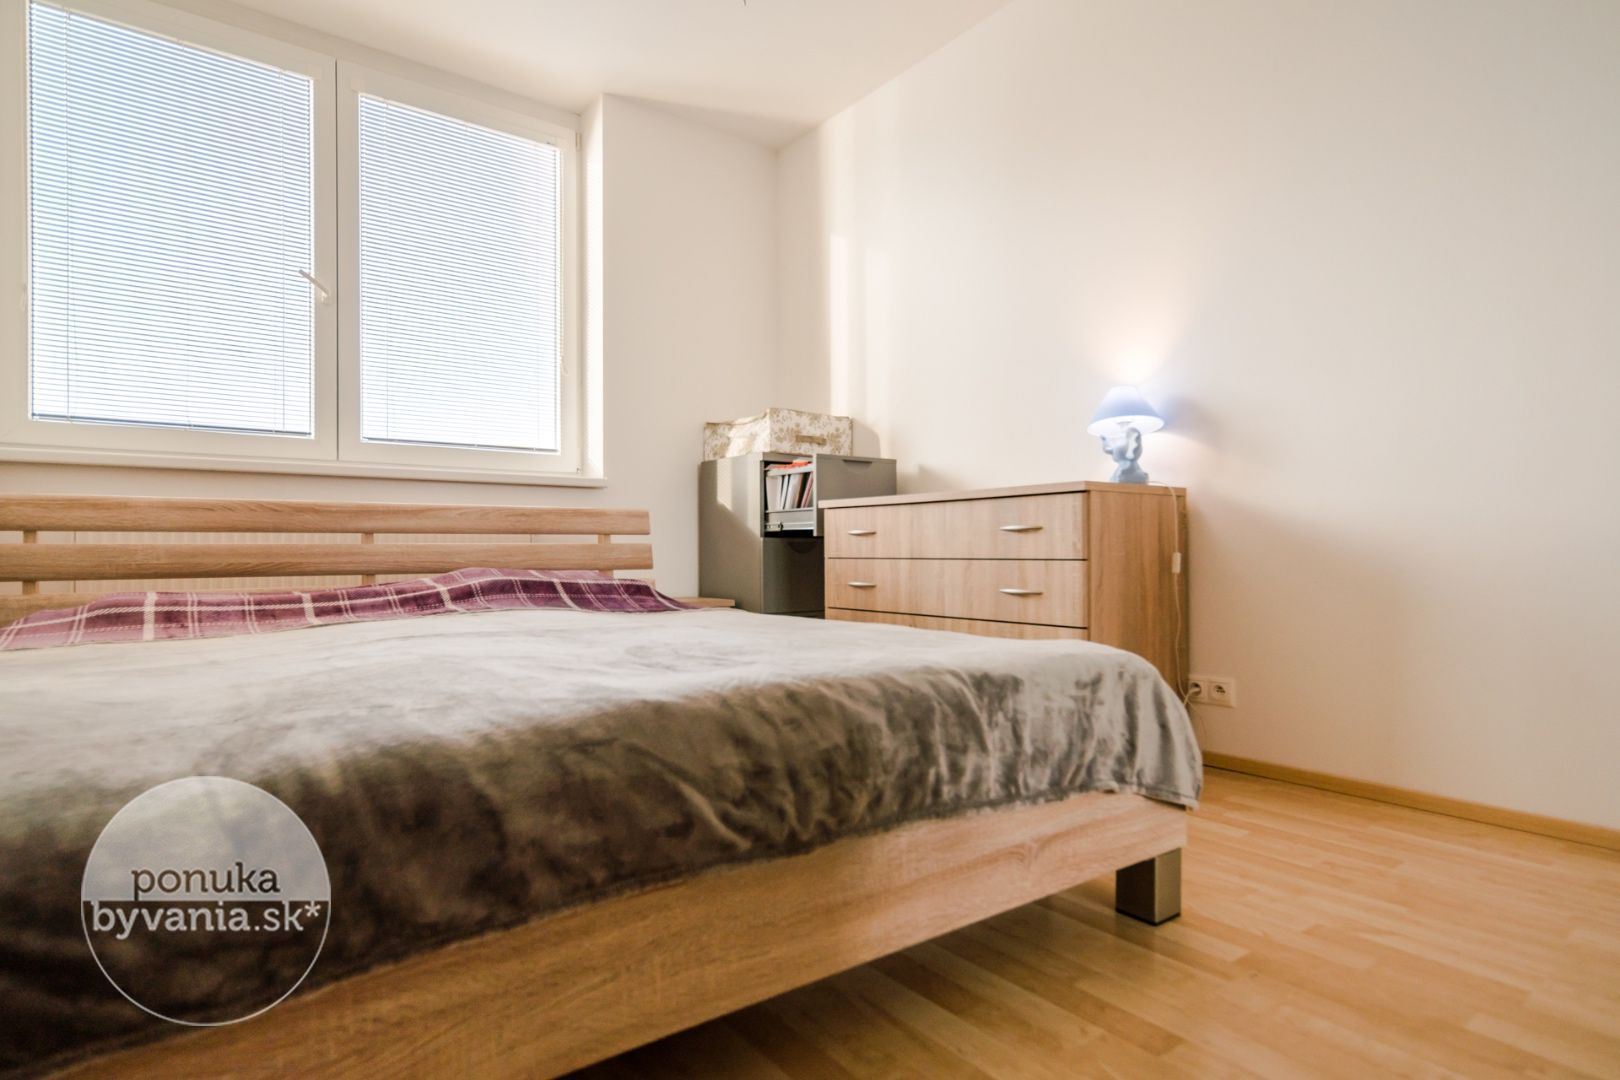 ponukabyvania.sk_Opletalova_3-izbový-byt_BEREC